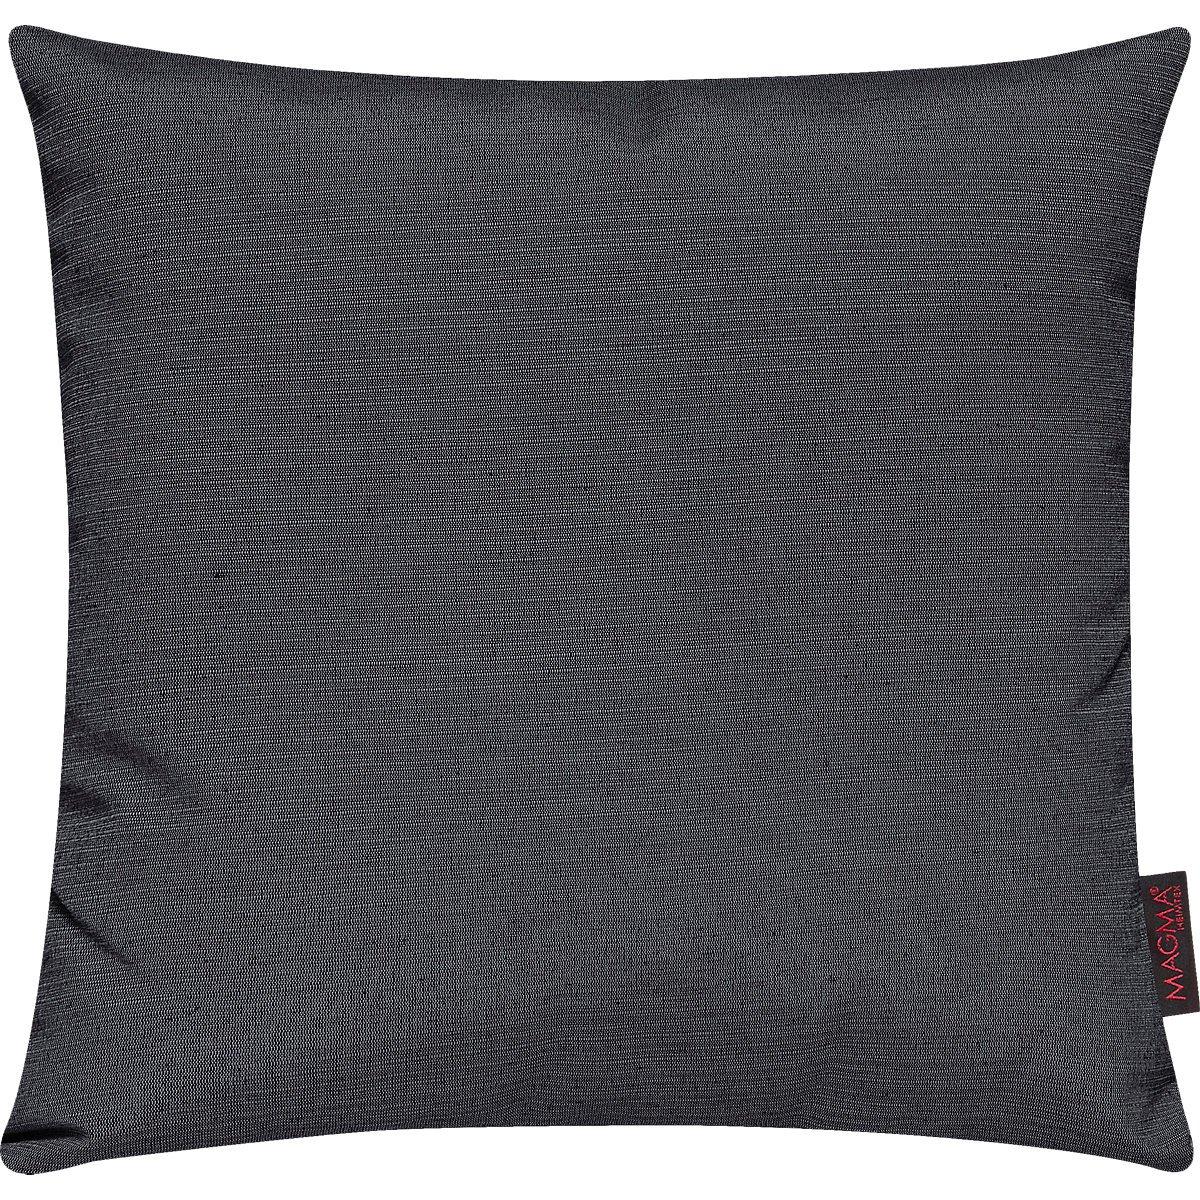 Kissenhülle mit Reißverschluß 50x50 cm,